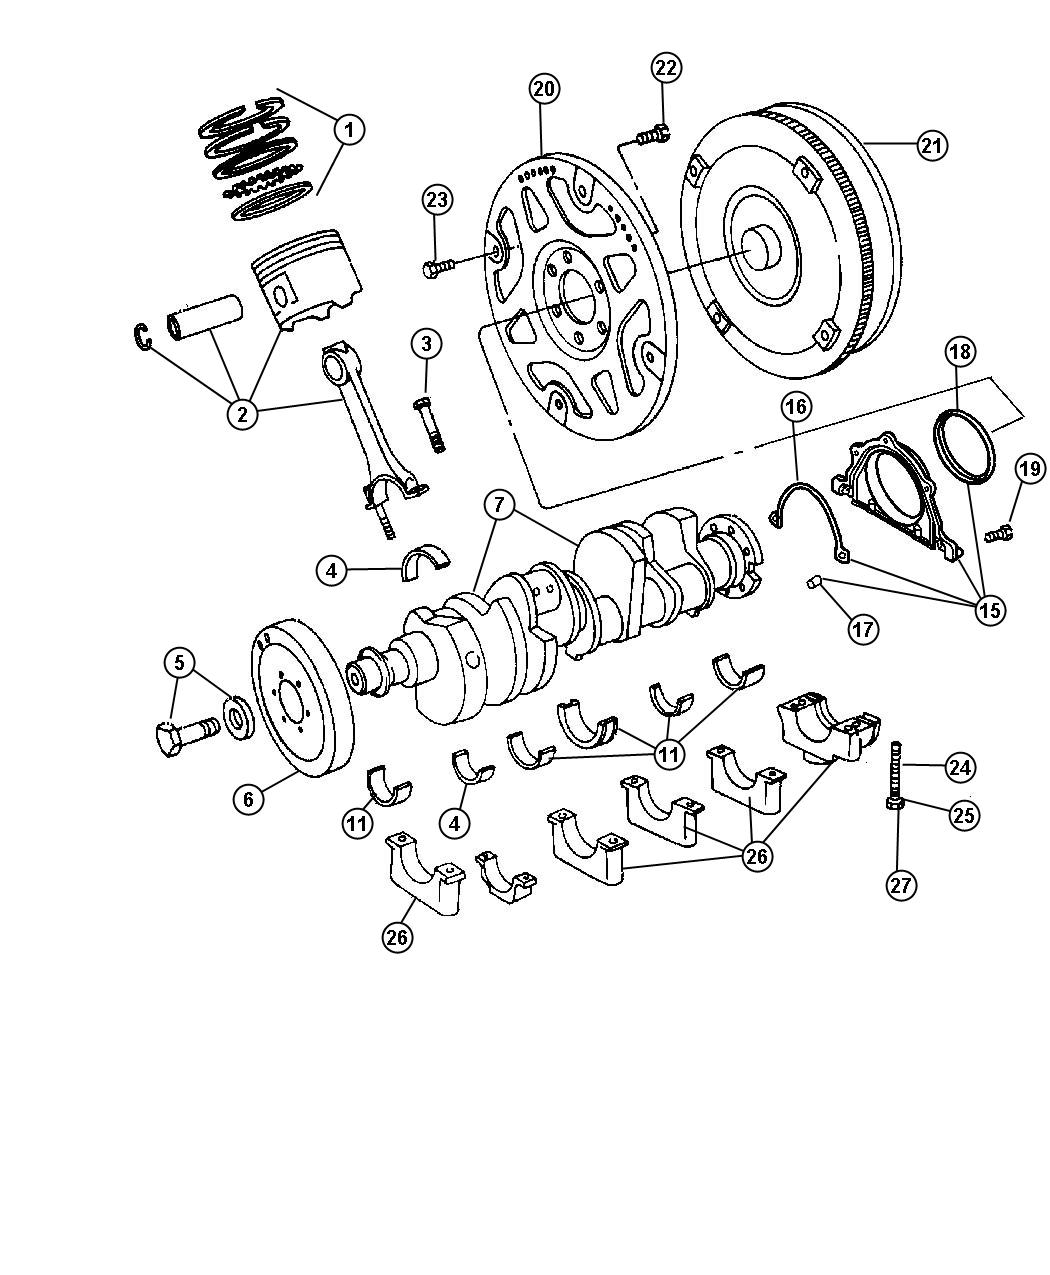 2009 Chrysler 300 Crankshaft. Engine. Tone, Ring, Esf